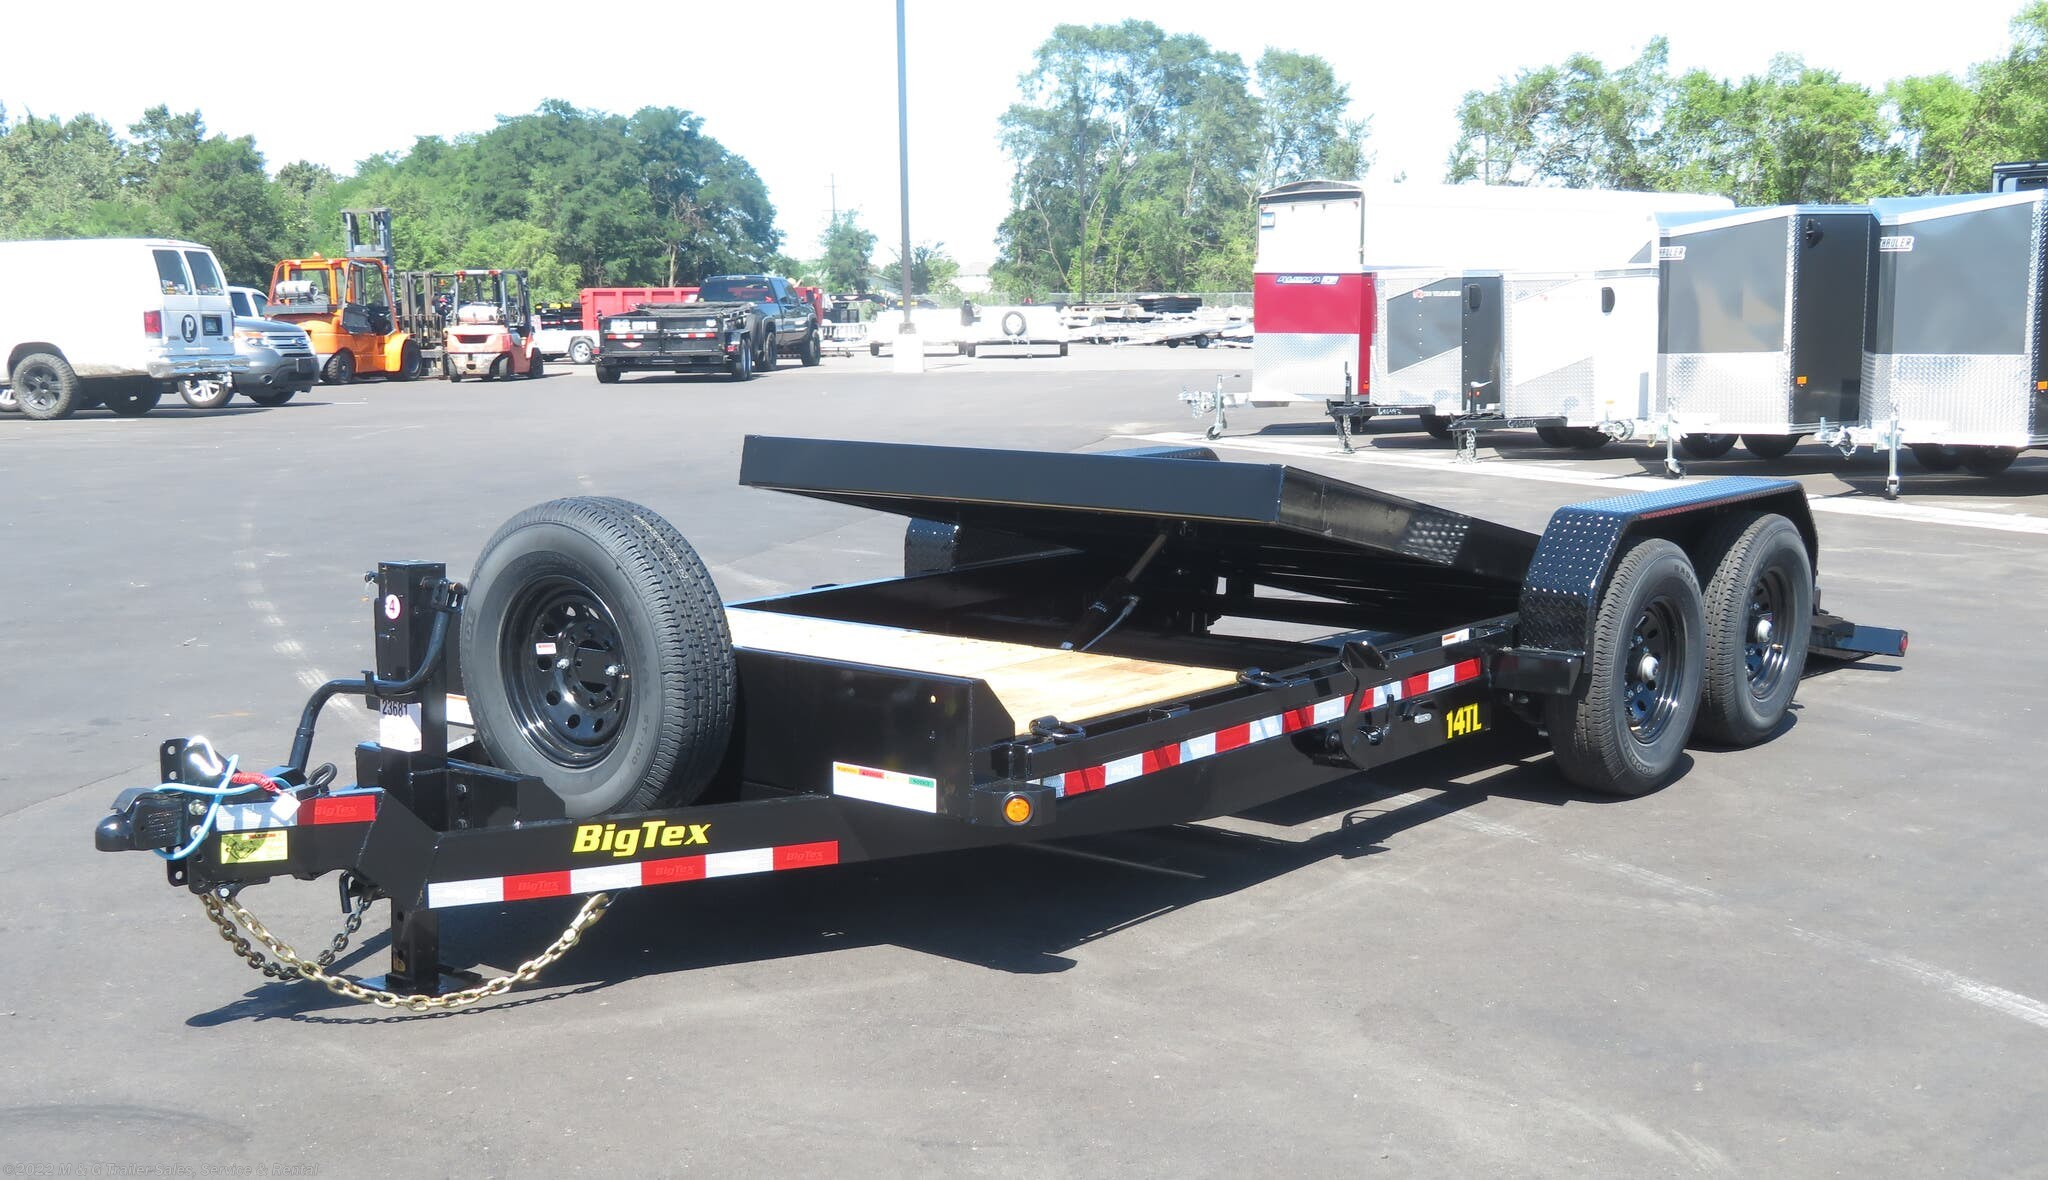 2022 Big Tex 20' Tilt Bed - 4' Stationary Deck - Stock #132071